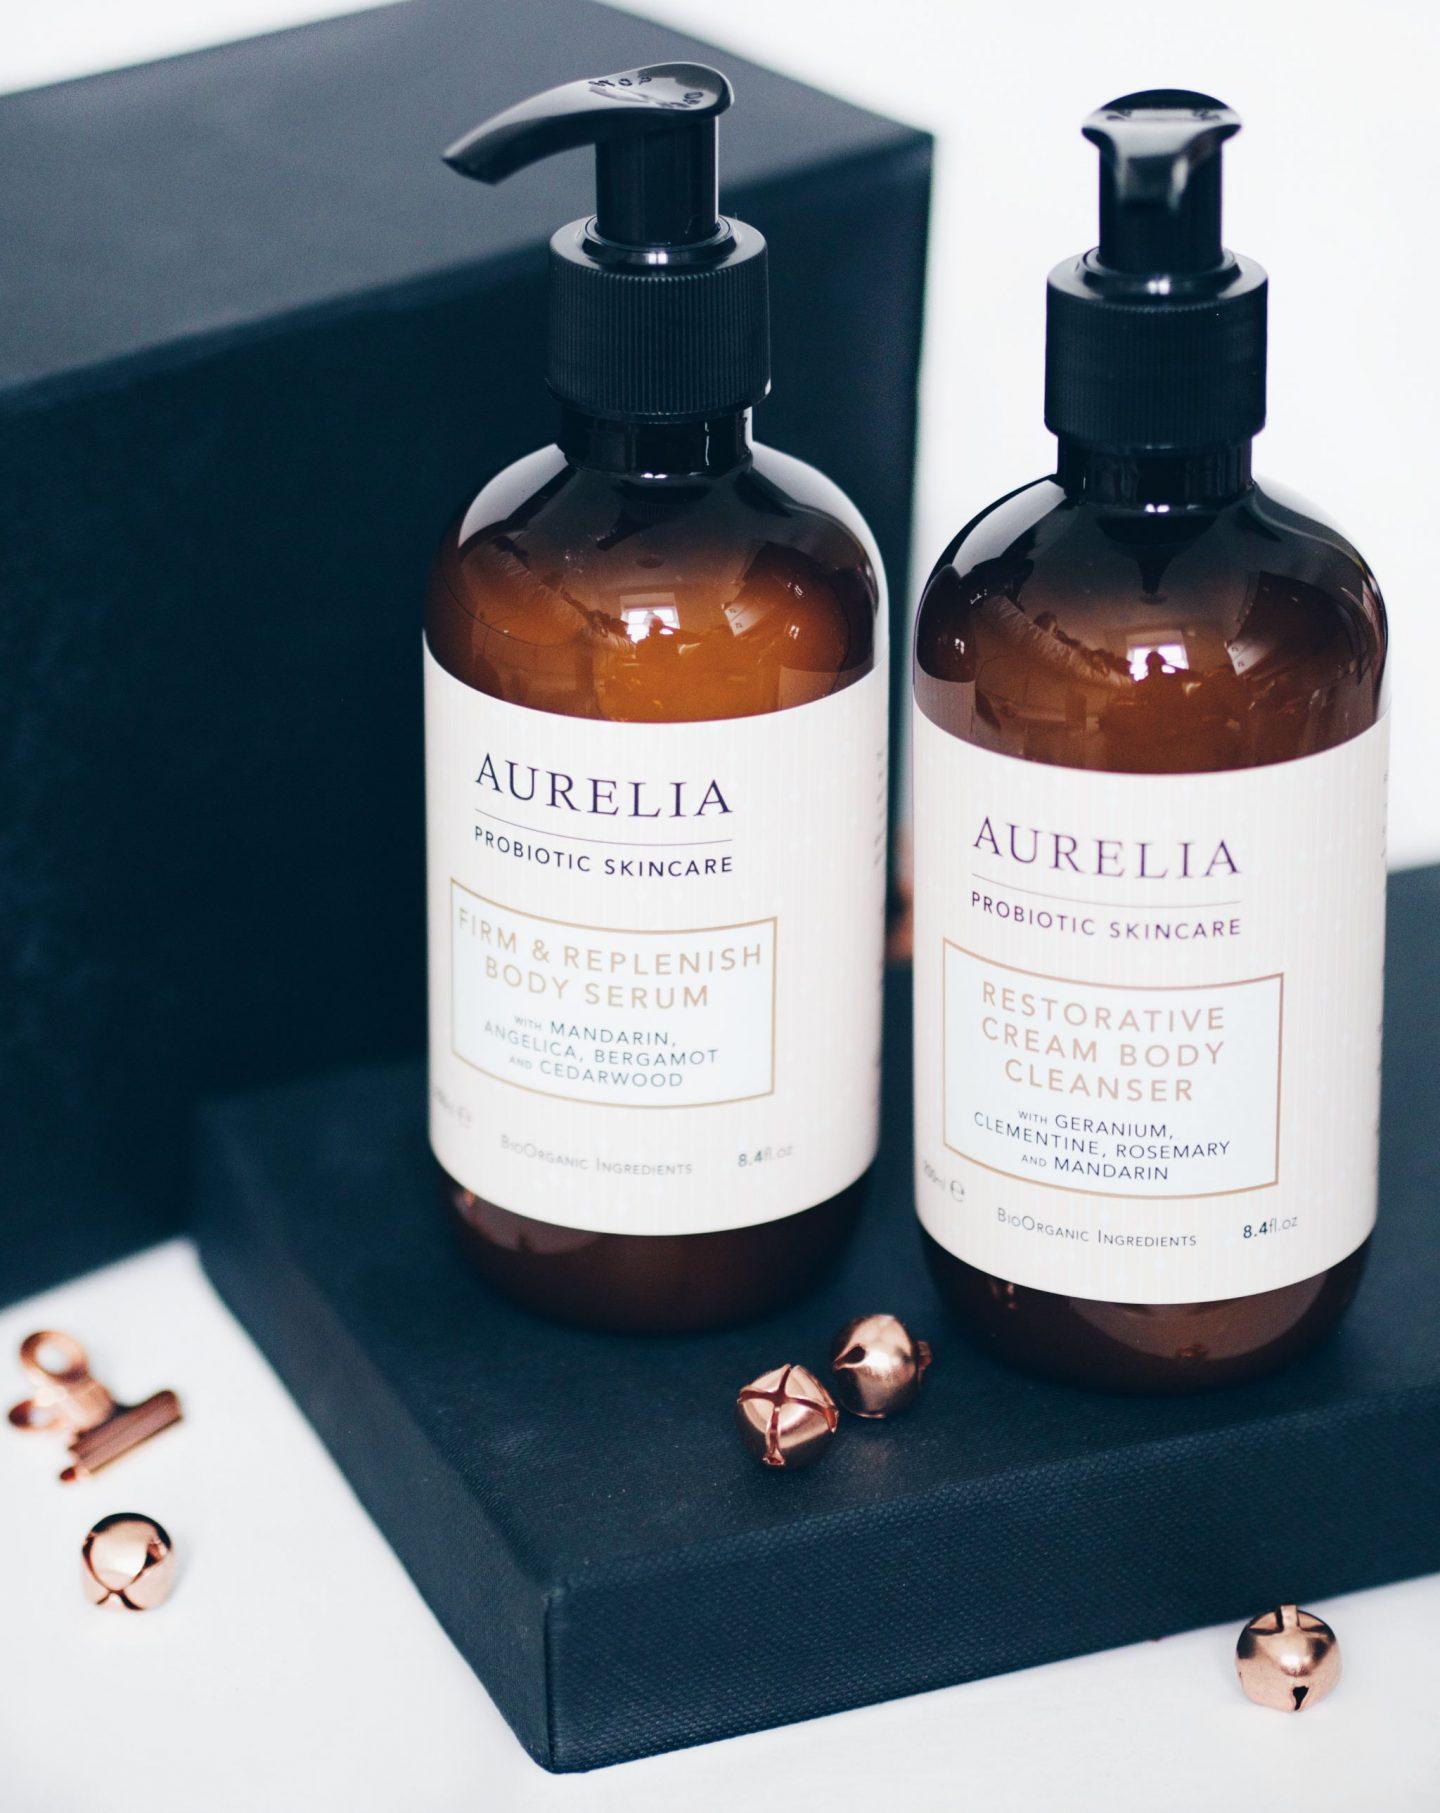 Aurelia body care